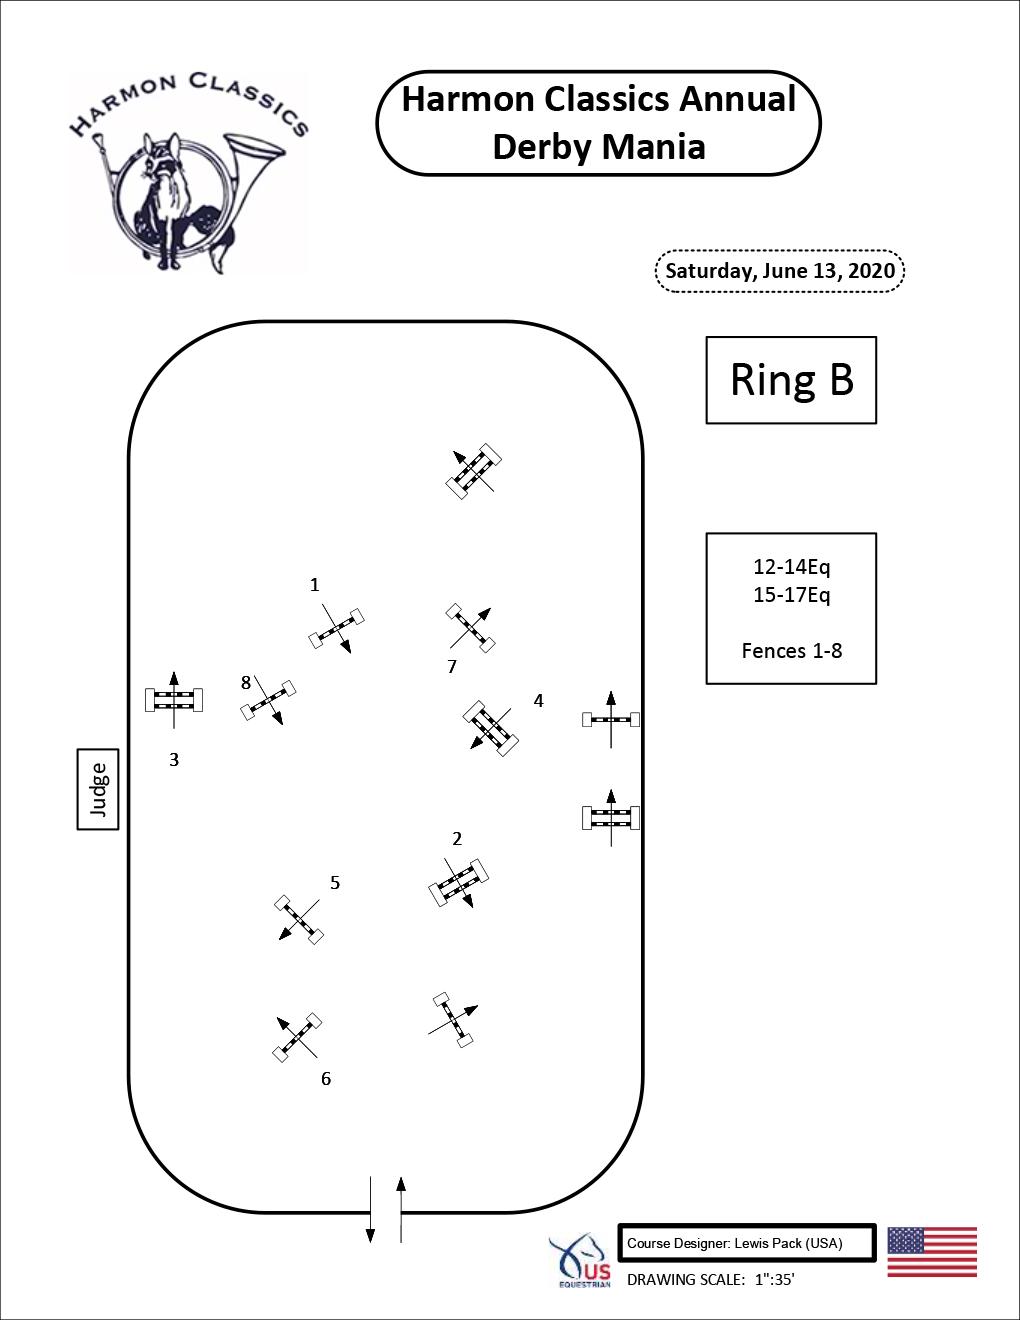 Ring-B-Saturday6-13-12-14-and-15-17-Equitation-Harmon-Classics-Derby-Mania